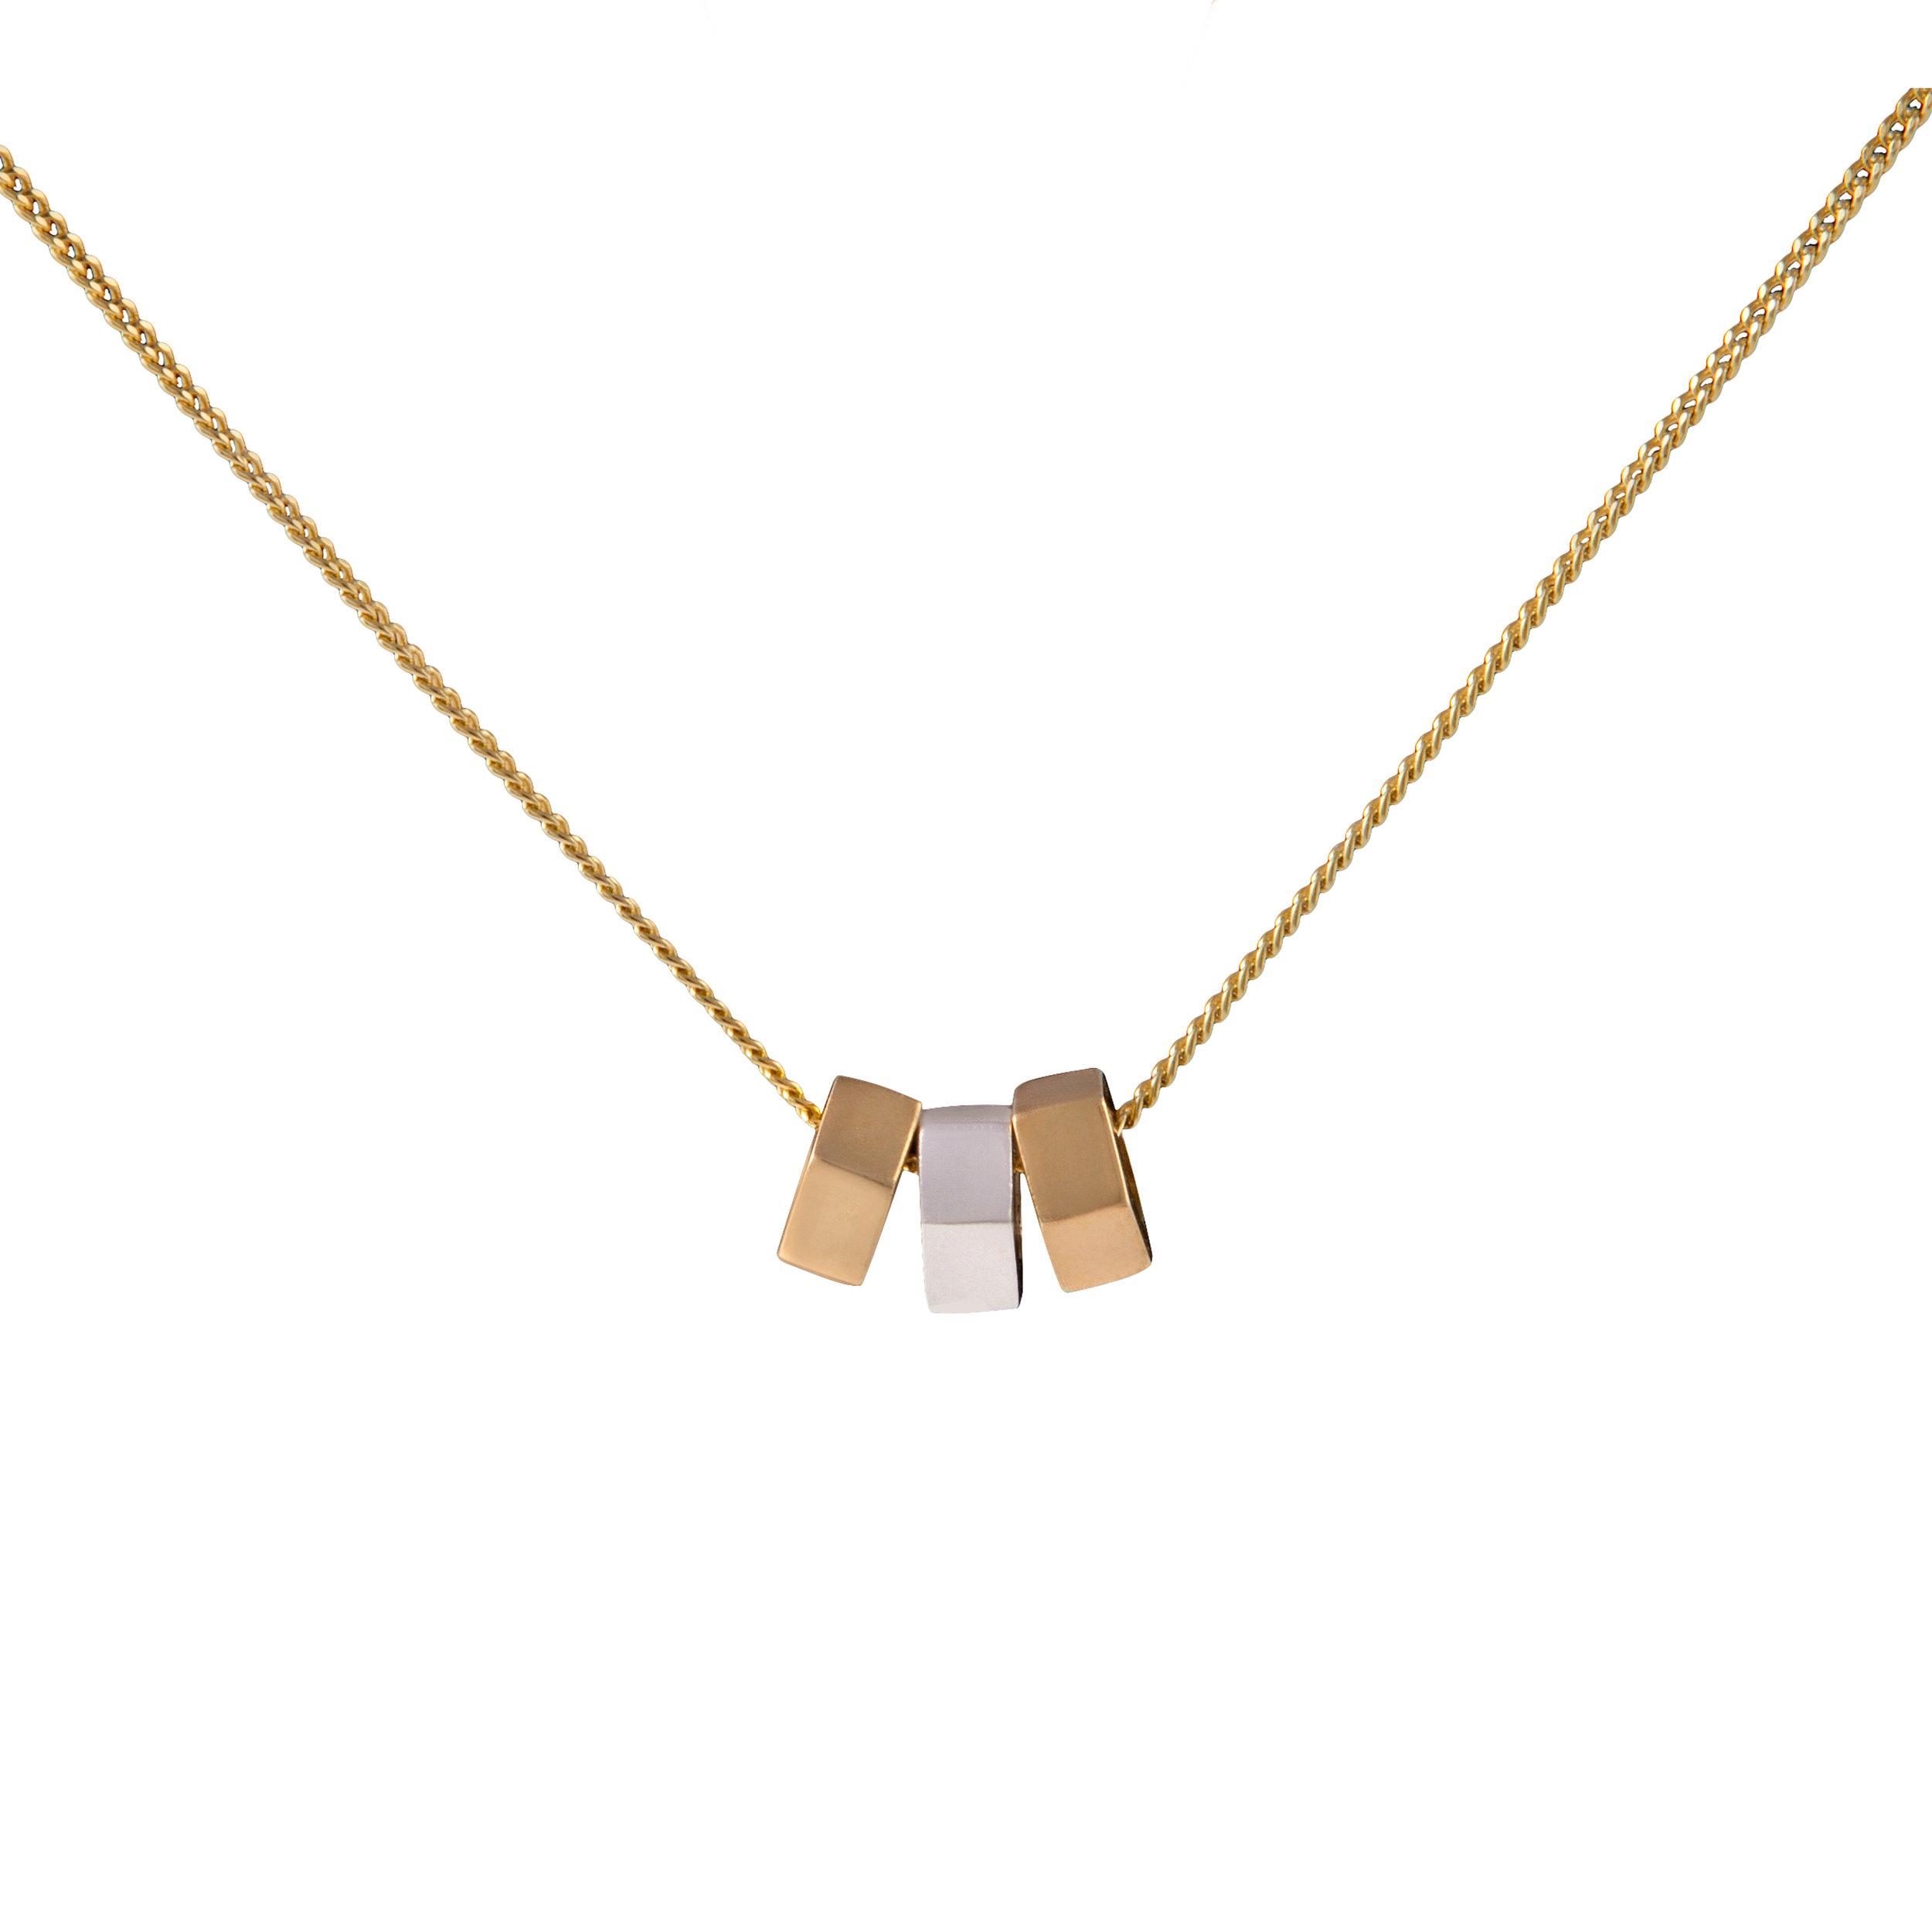 Triple Stellation Necklace